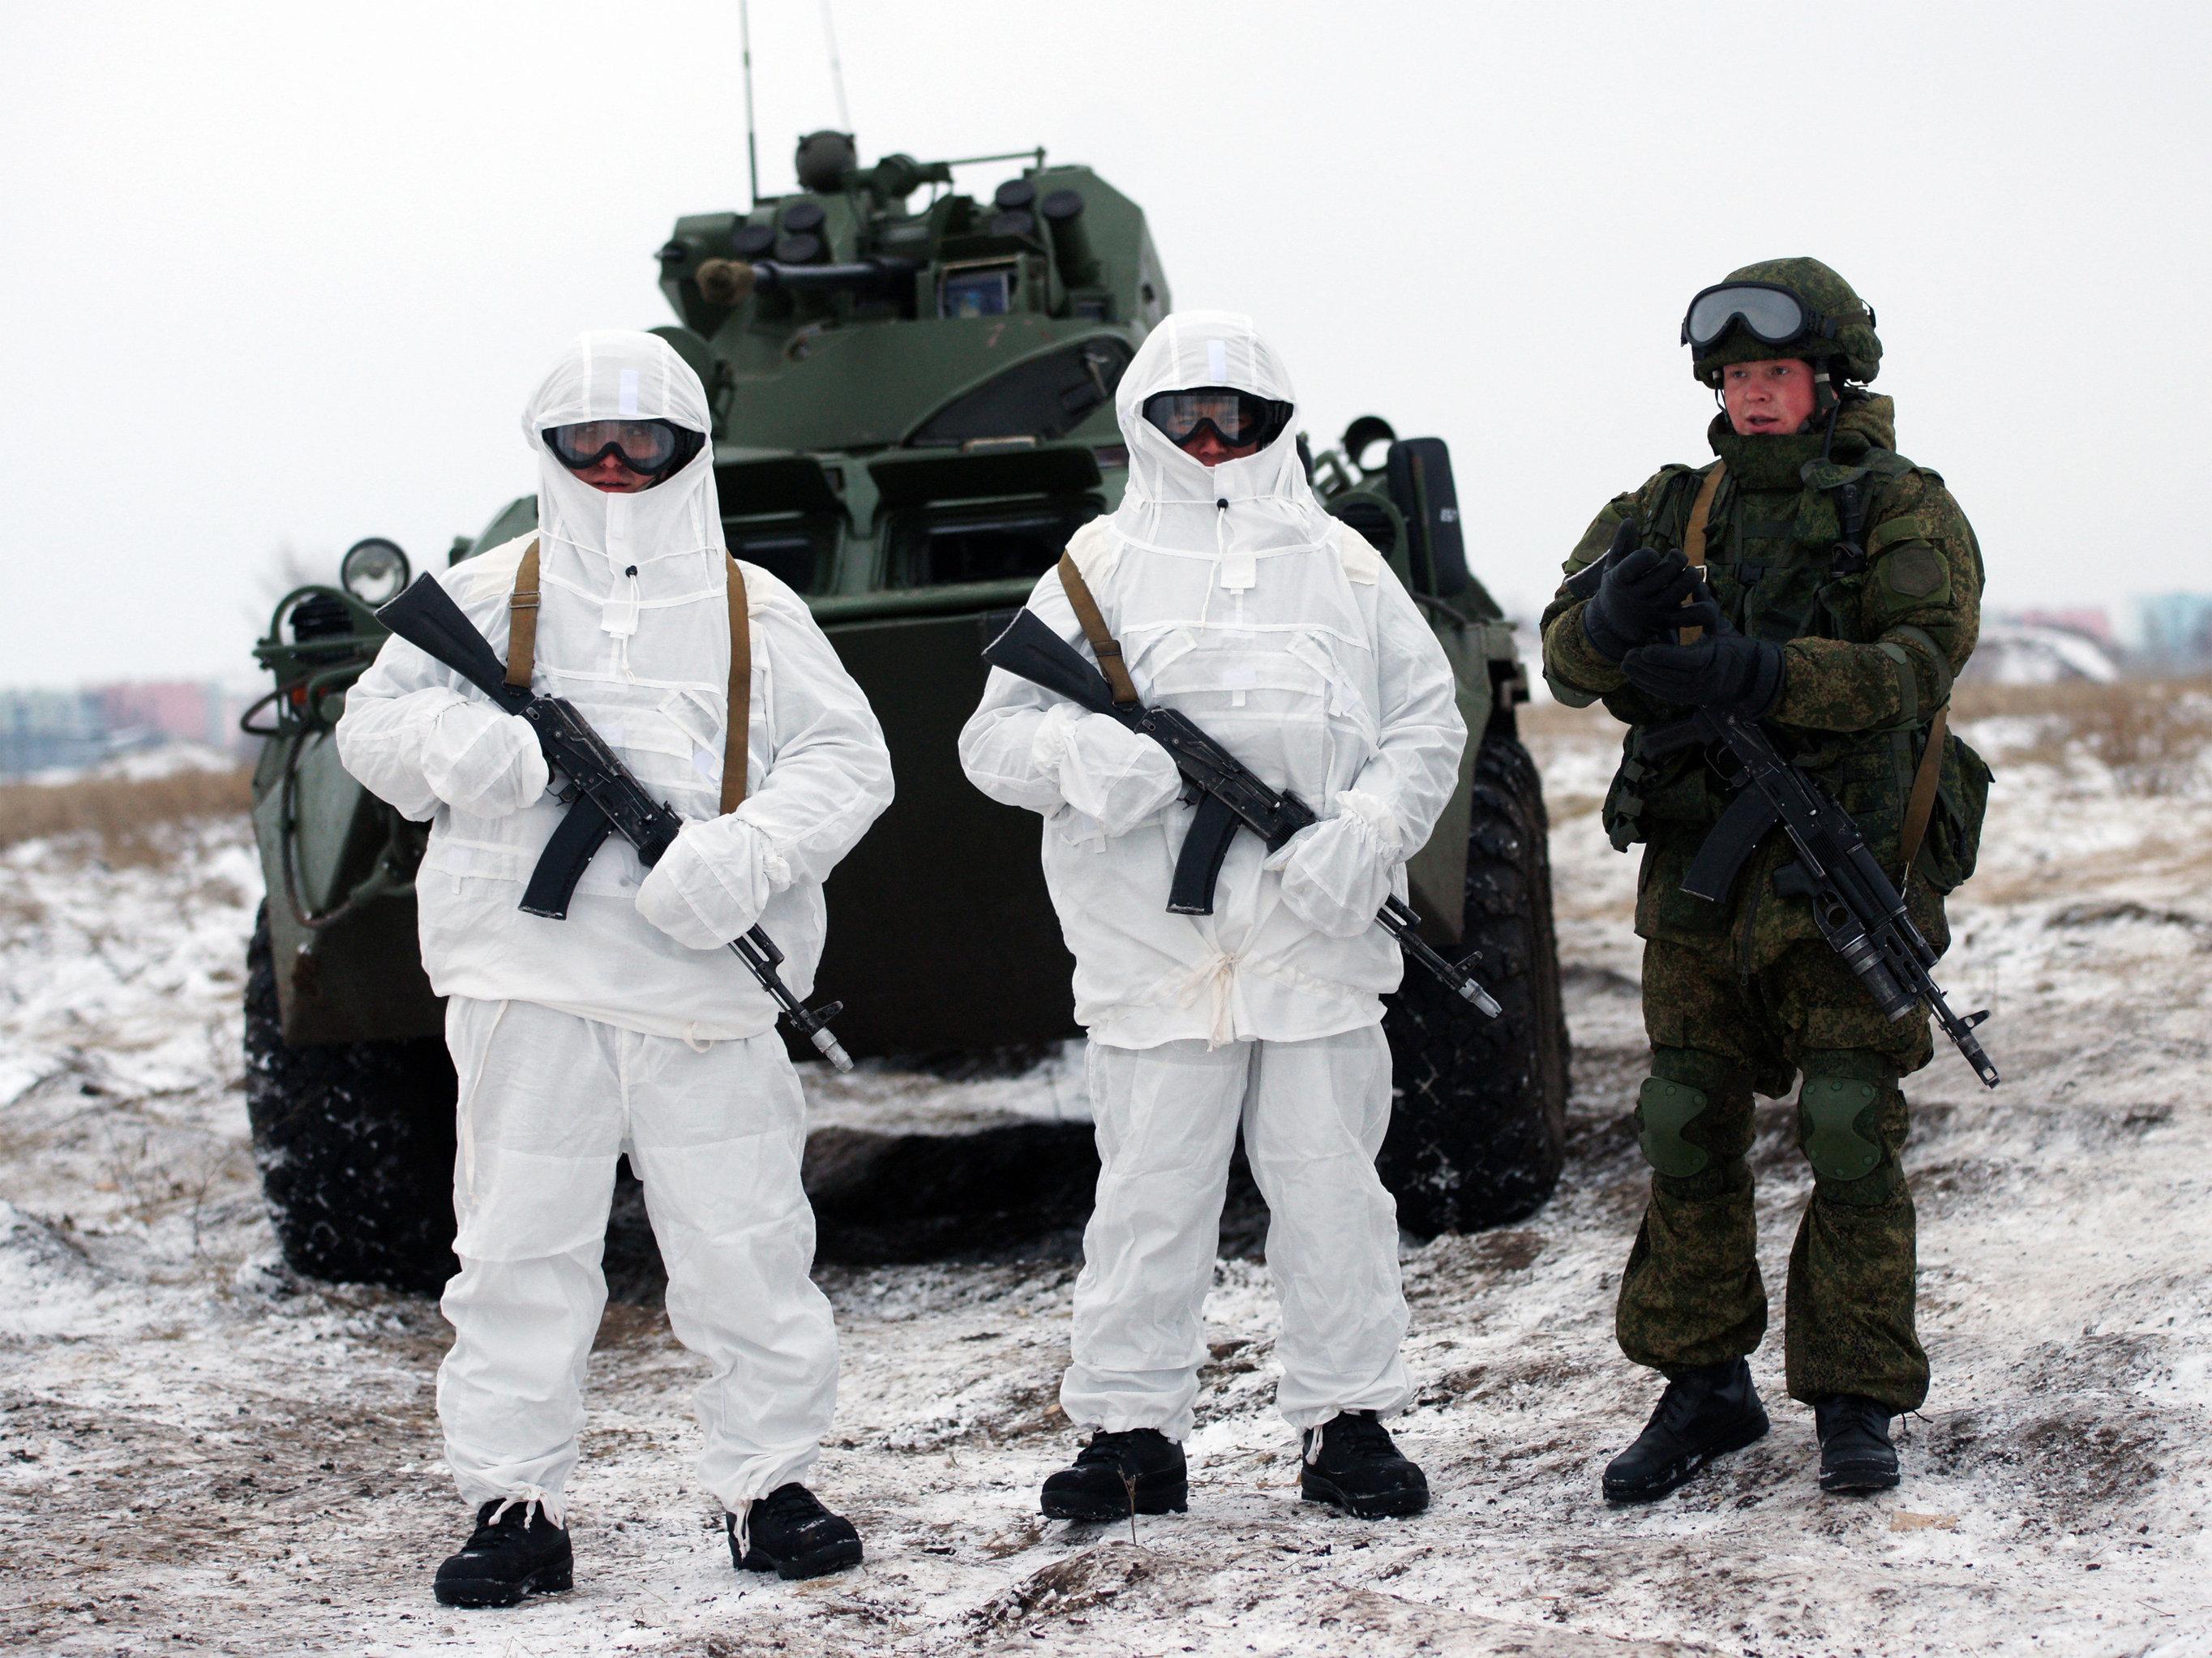 General assault armor 6B43: description, characteristics, protection class 75